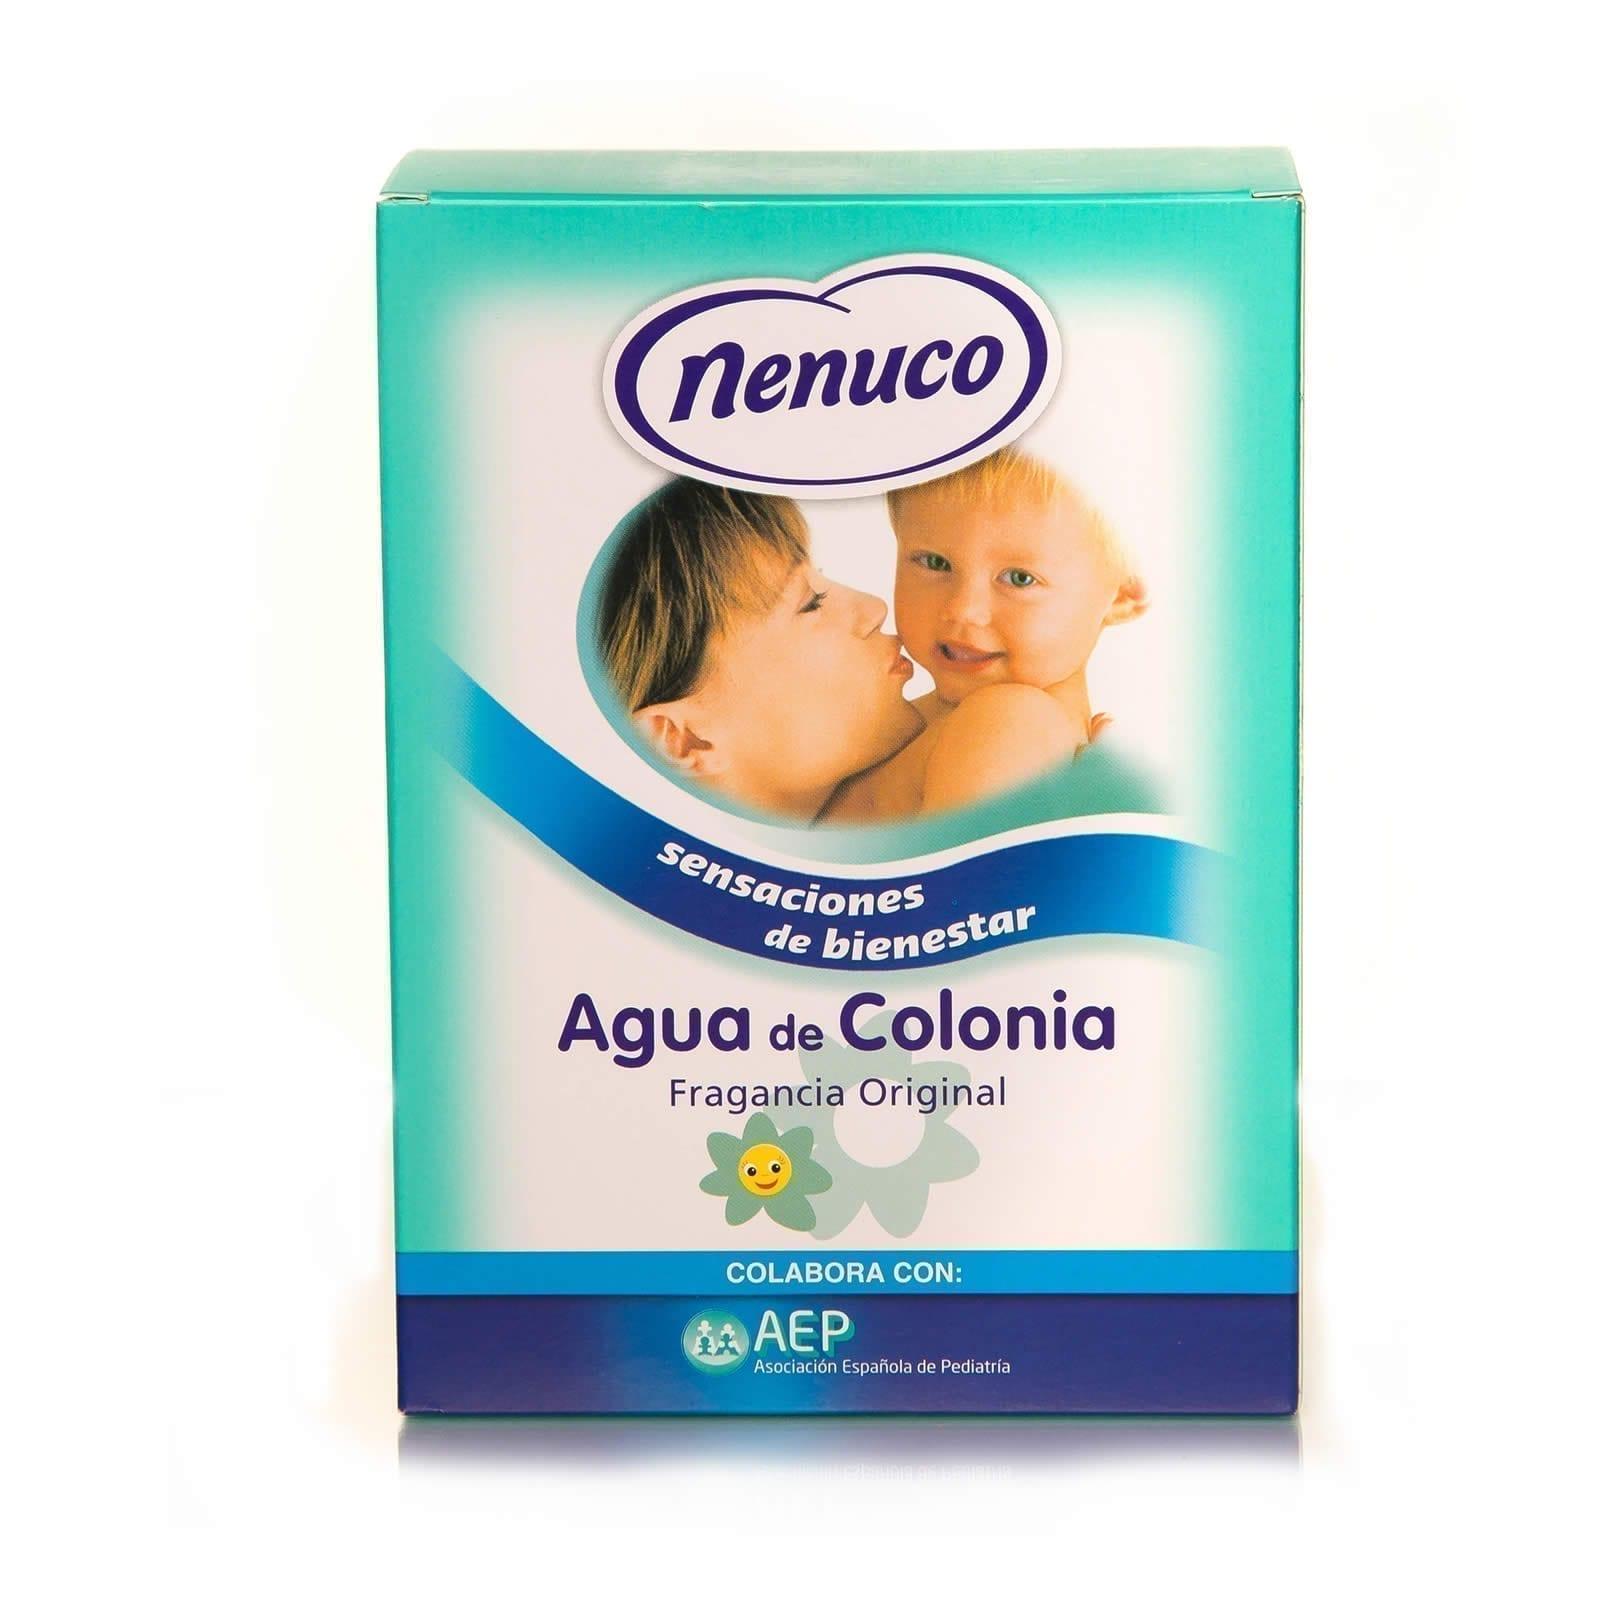 Nenuco Agua de Cologne  - 200 ml